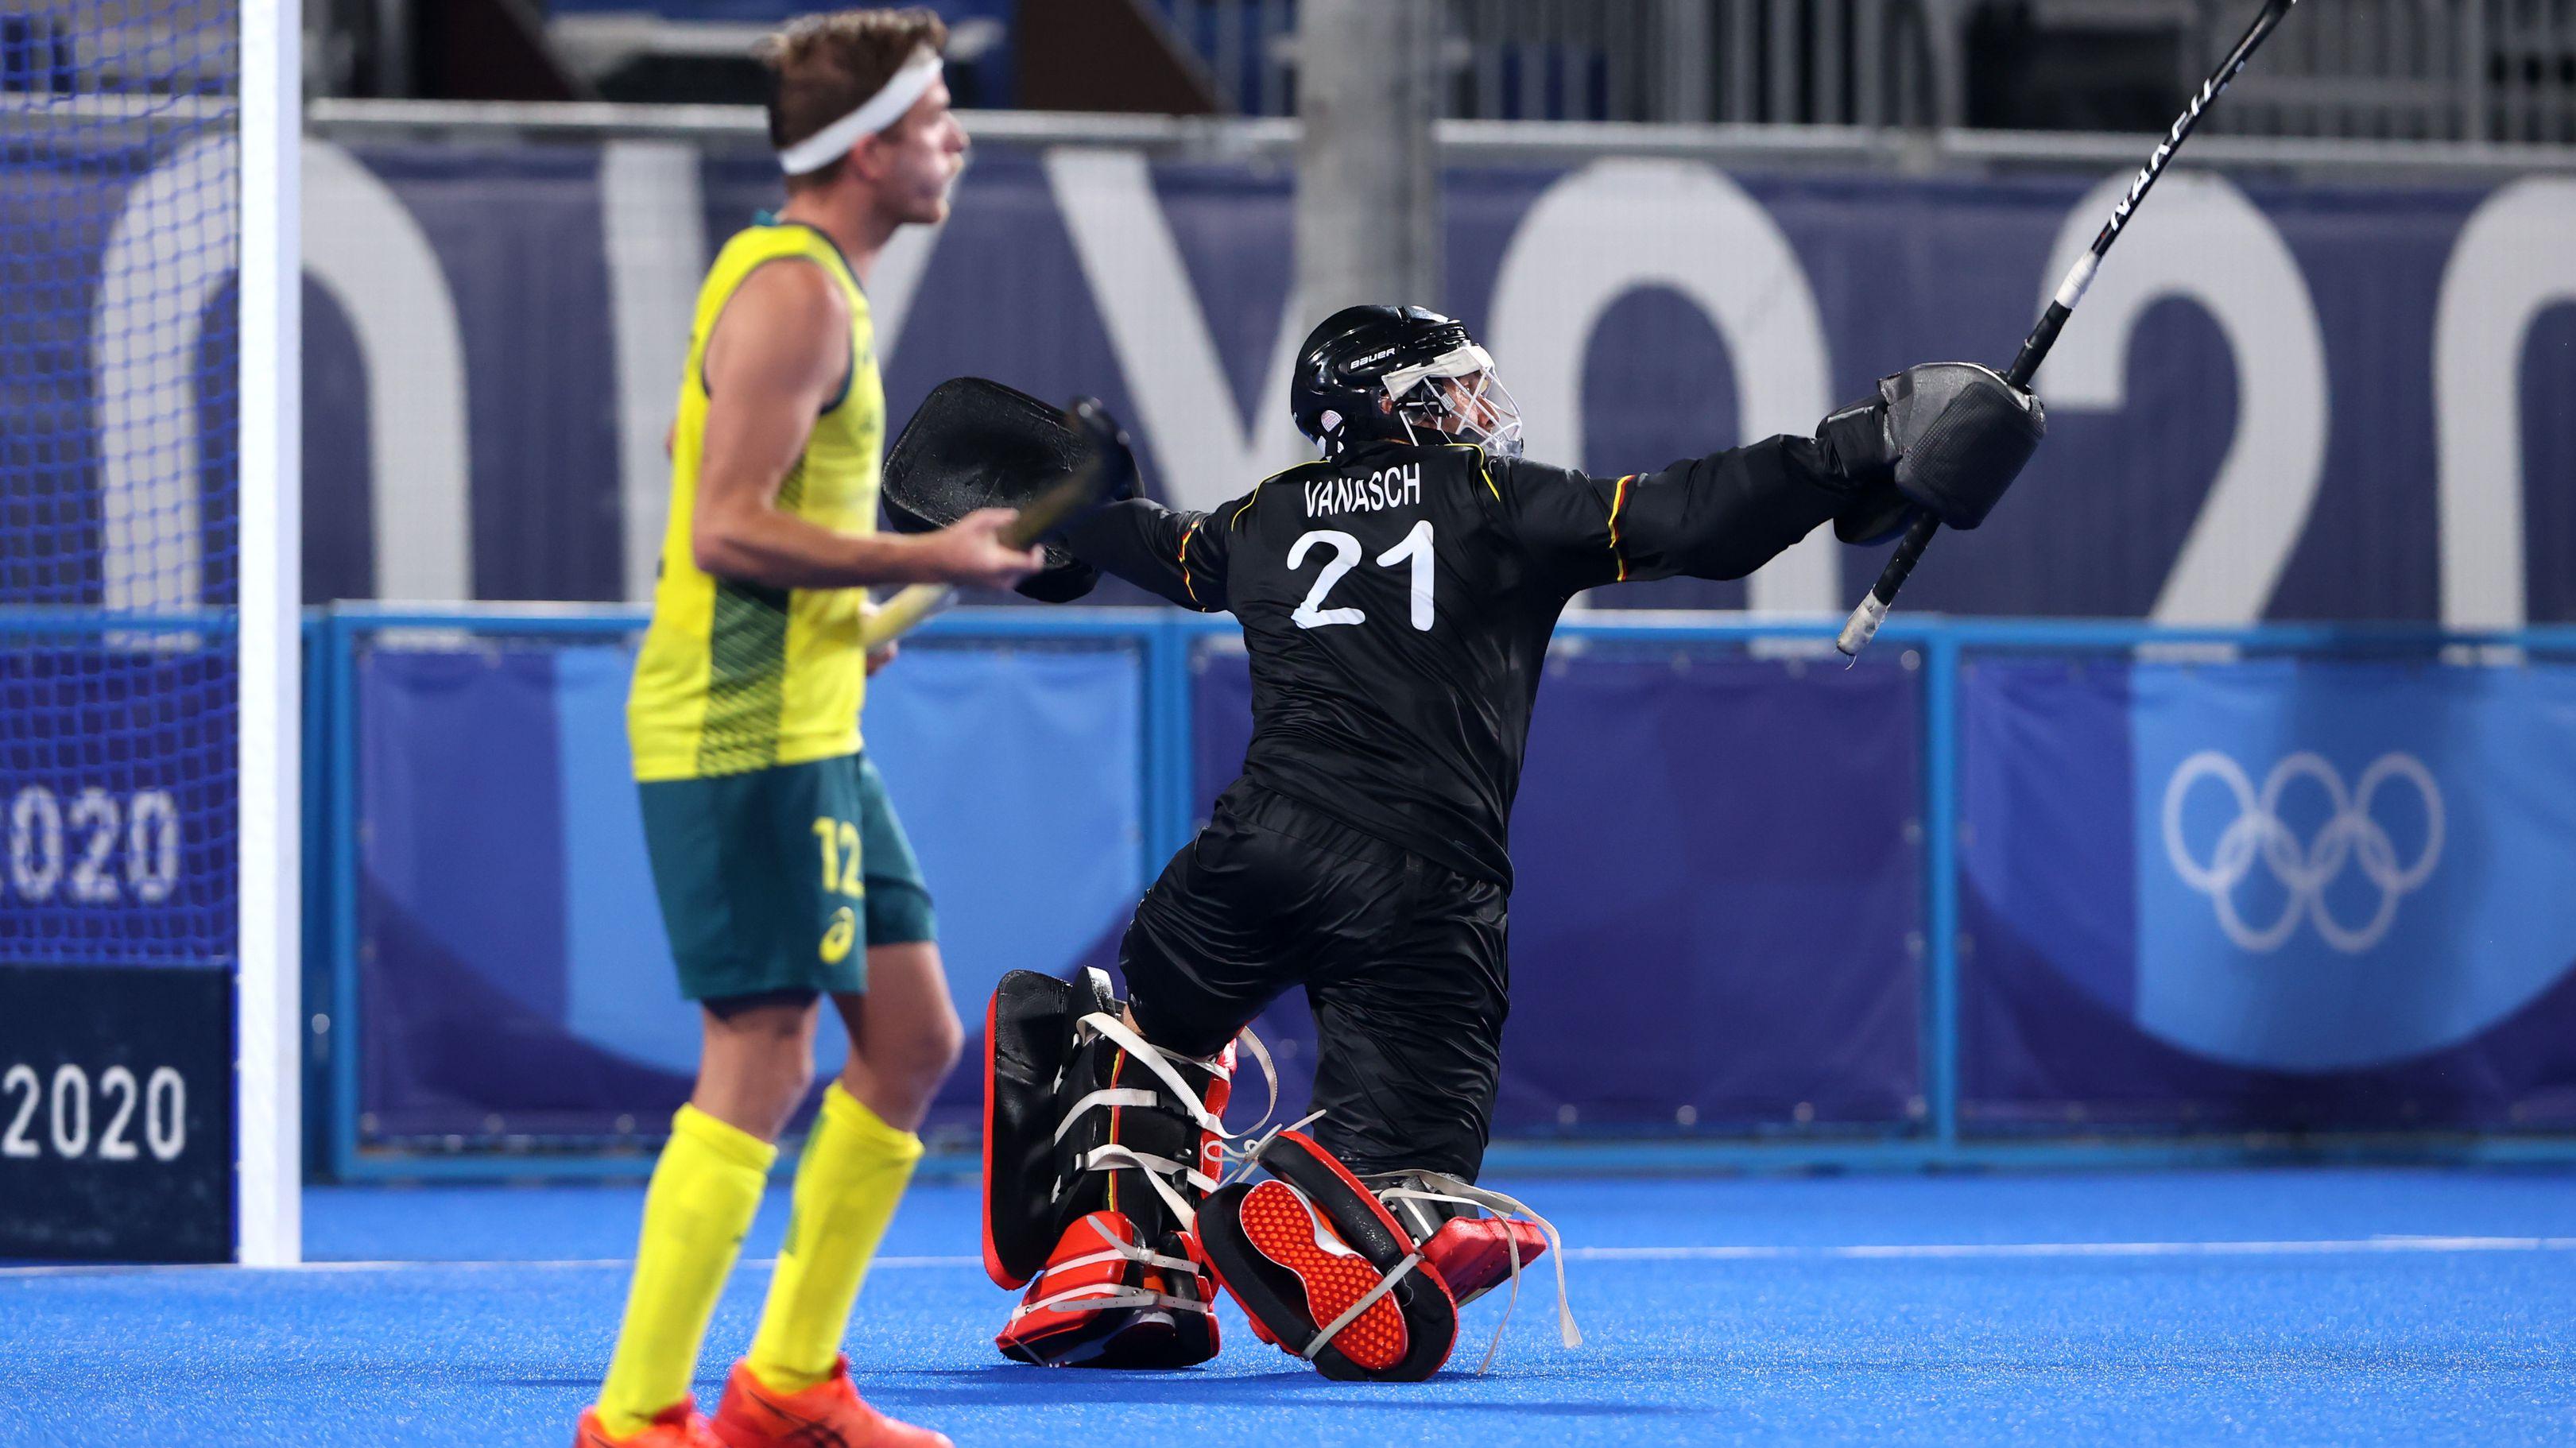 Despair for Aussies as Belgium snatches gold